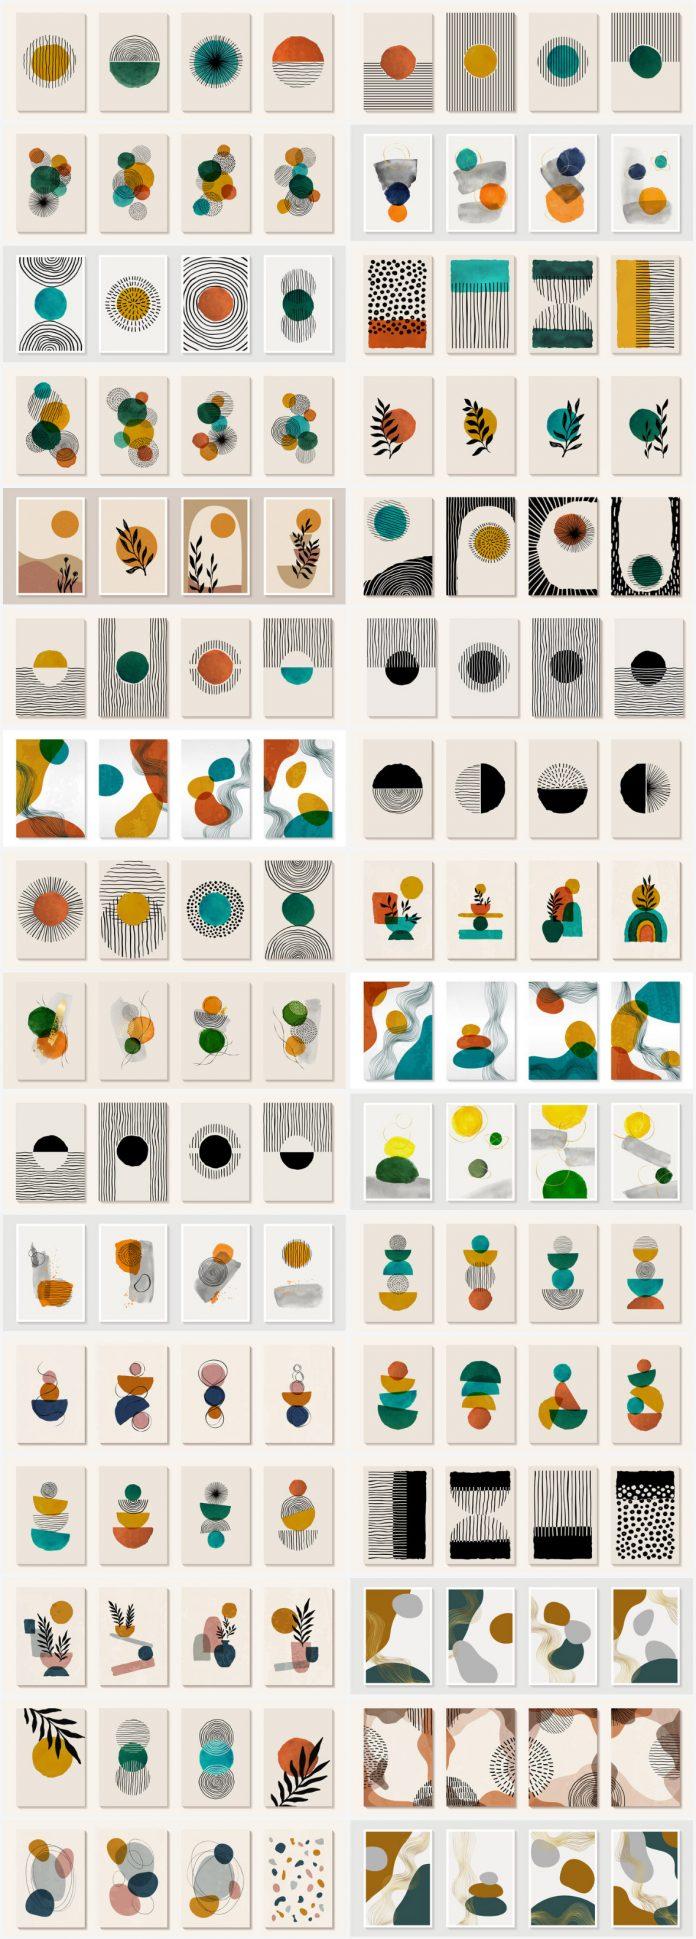 Vector graphics of minimalist, geometric modern art.